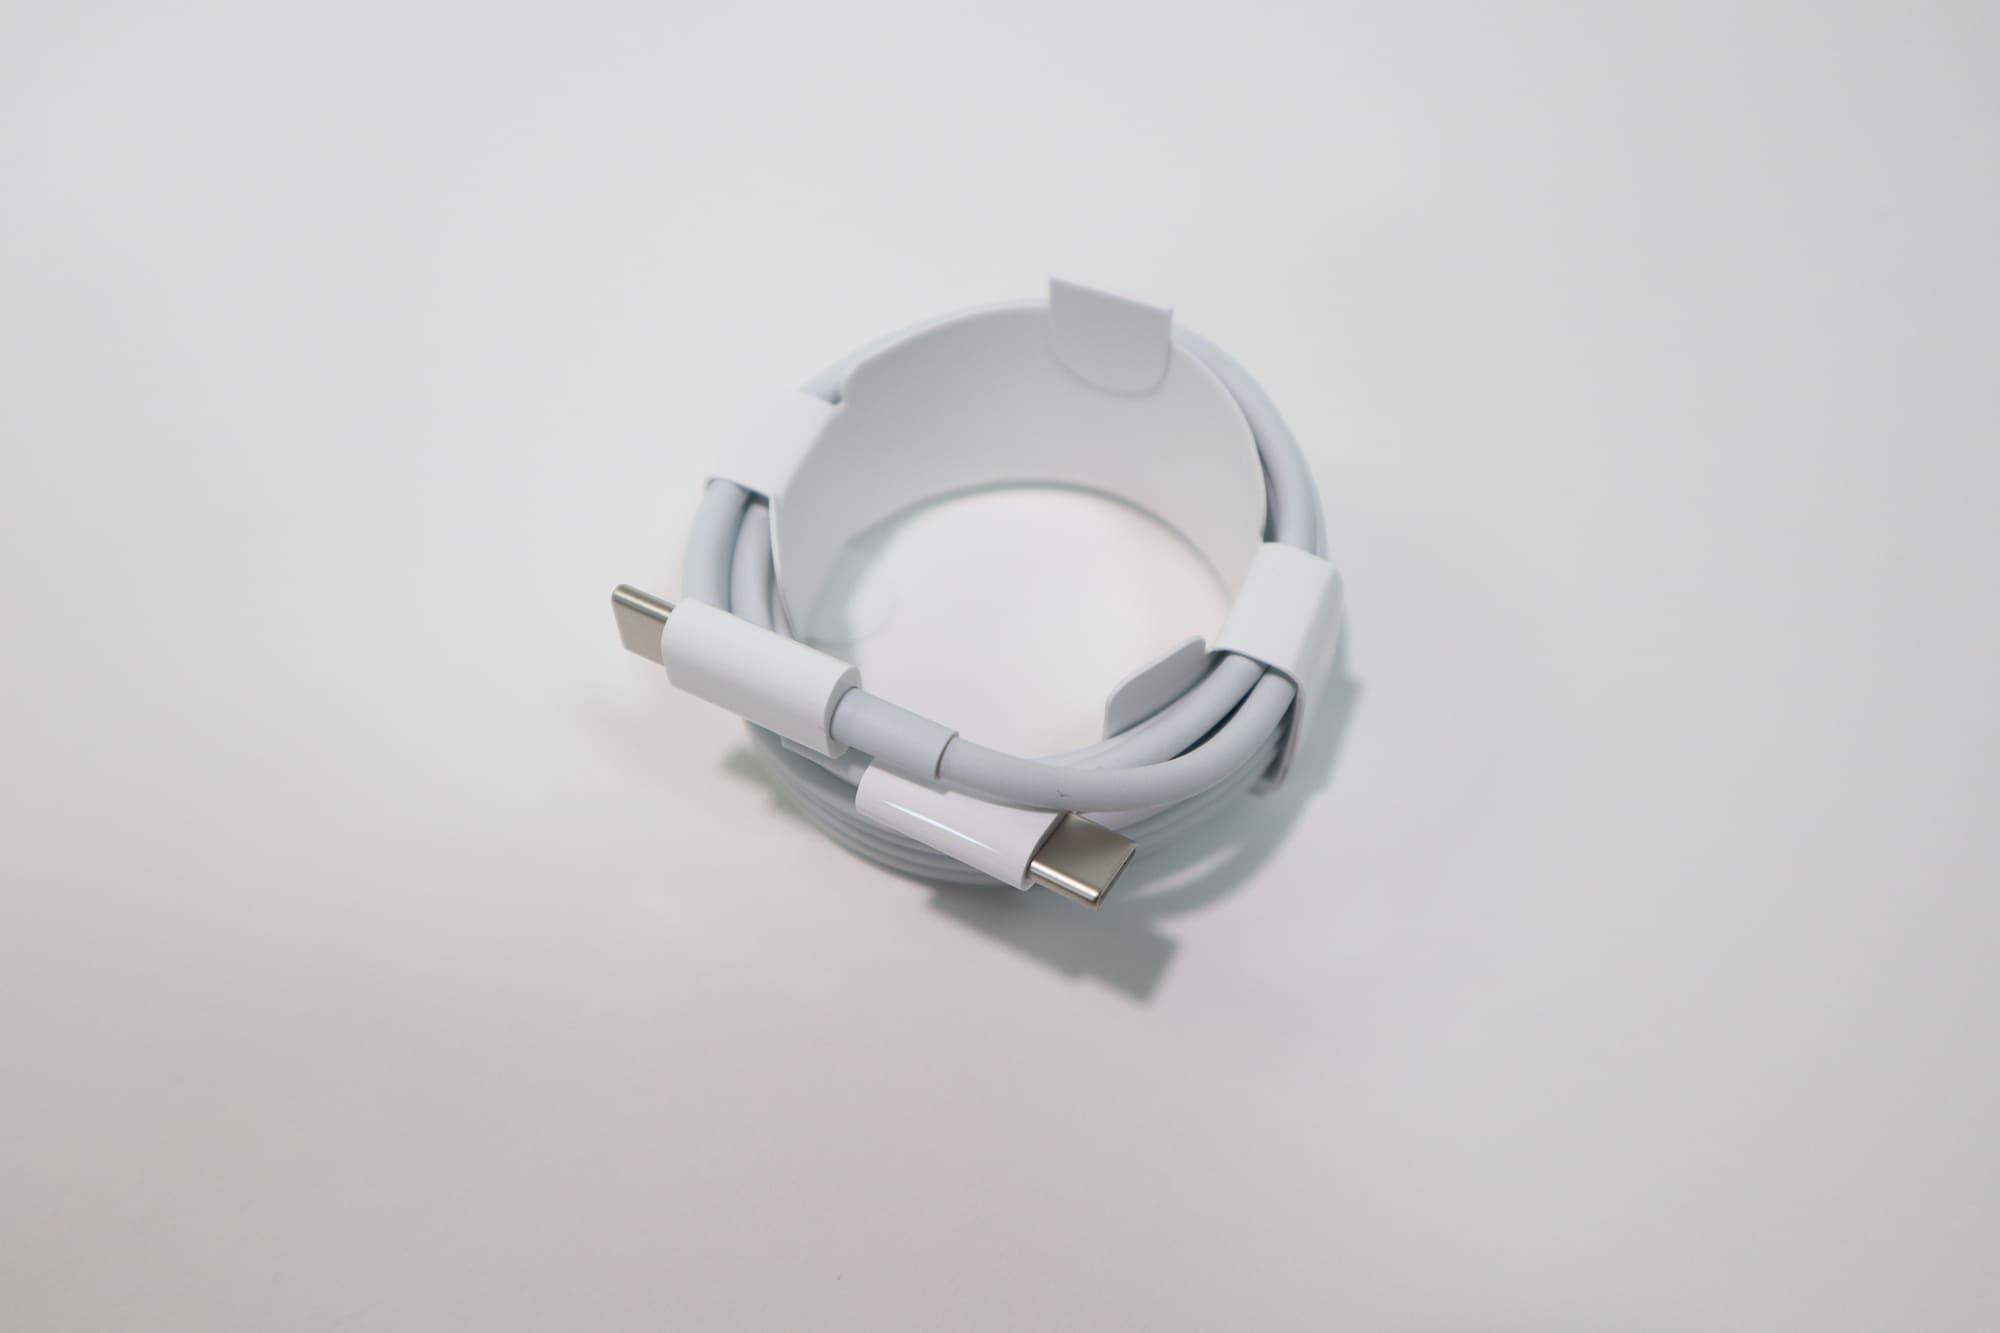 MacBook Air 2020付属の充電ケーブル